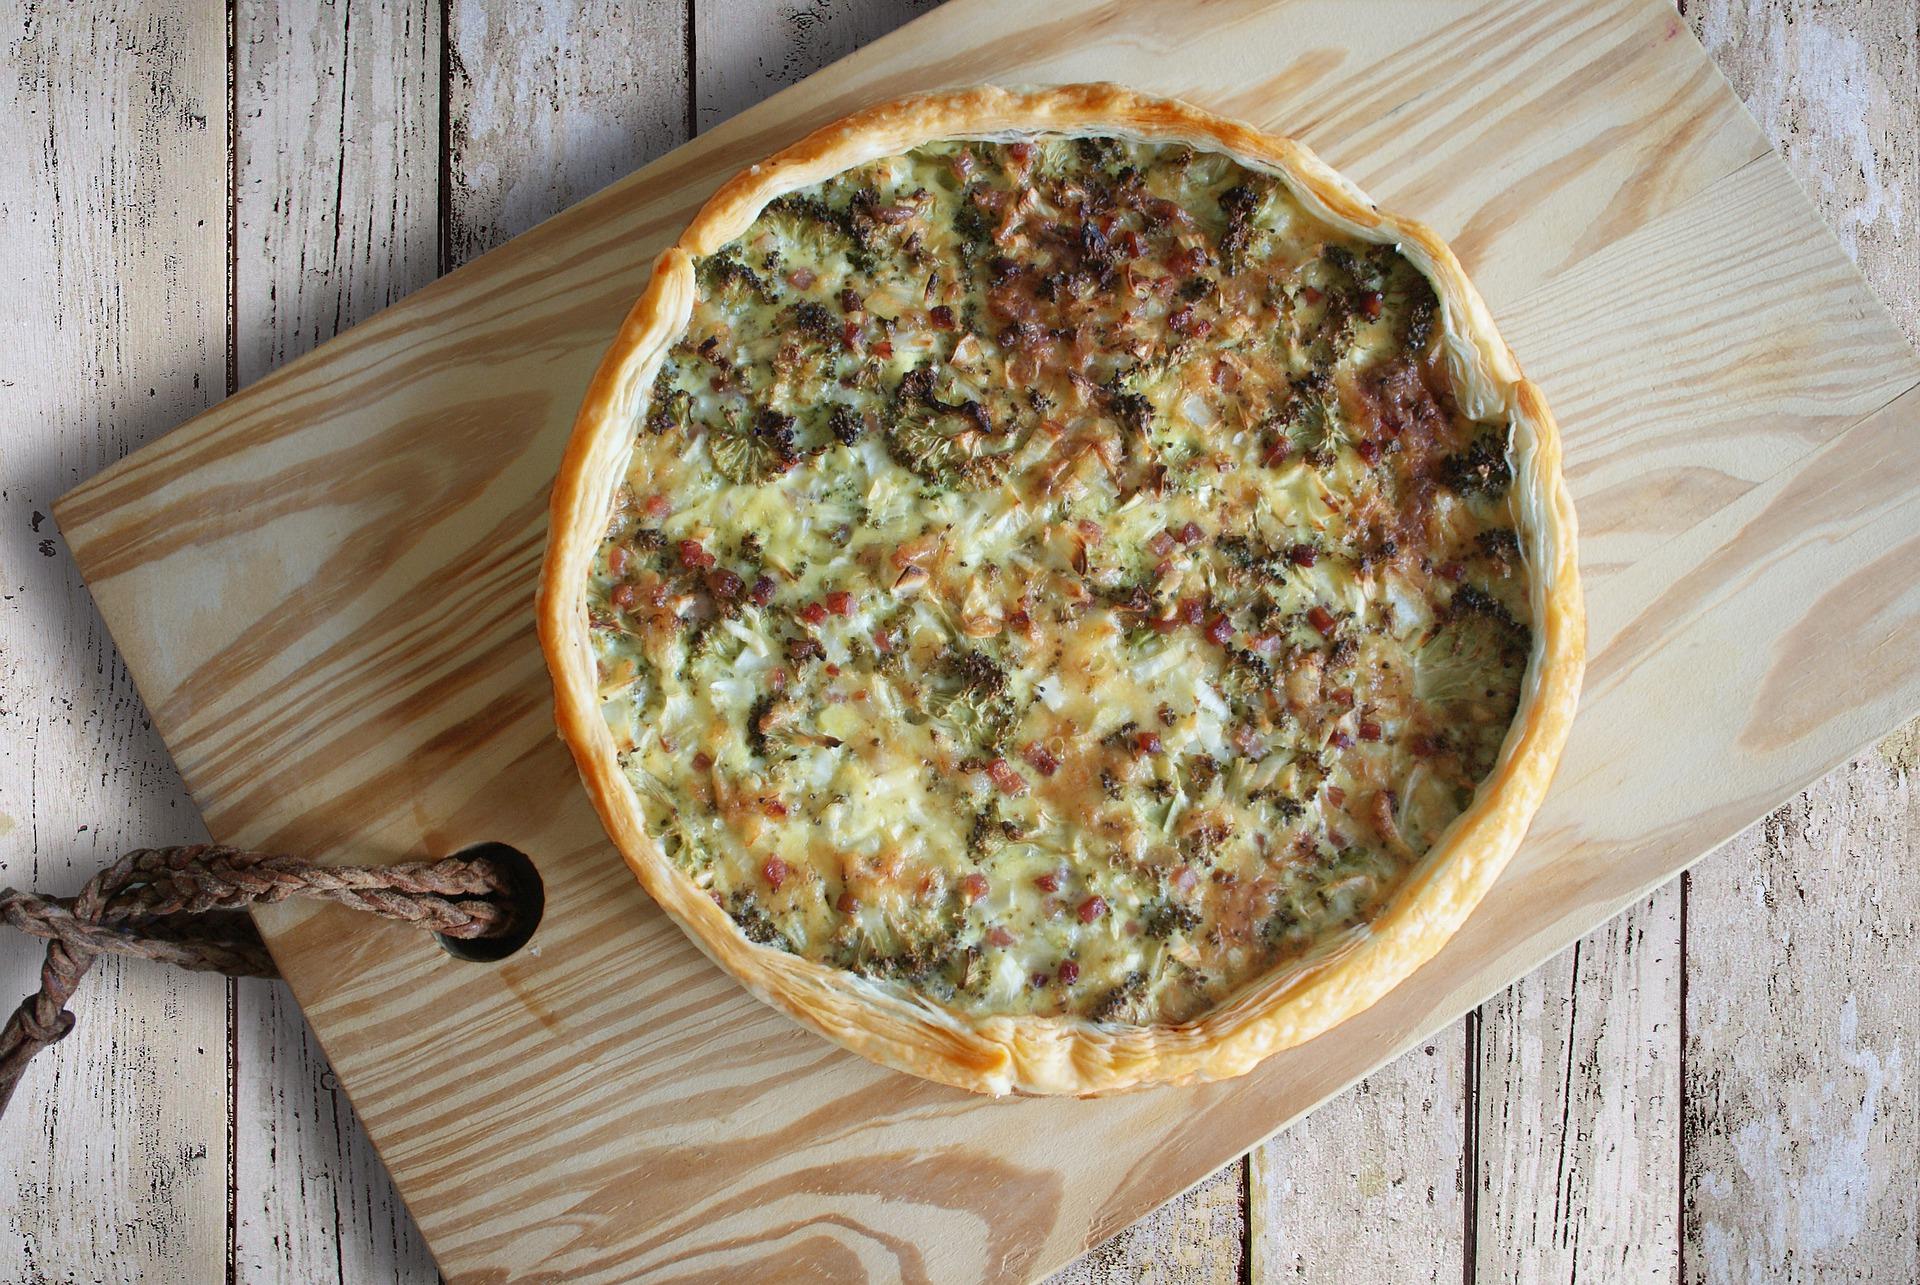 torta salata broccoli salsiccia e gorgonzola